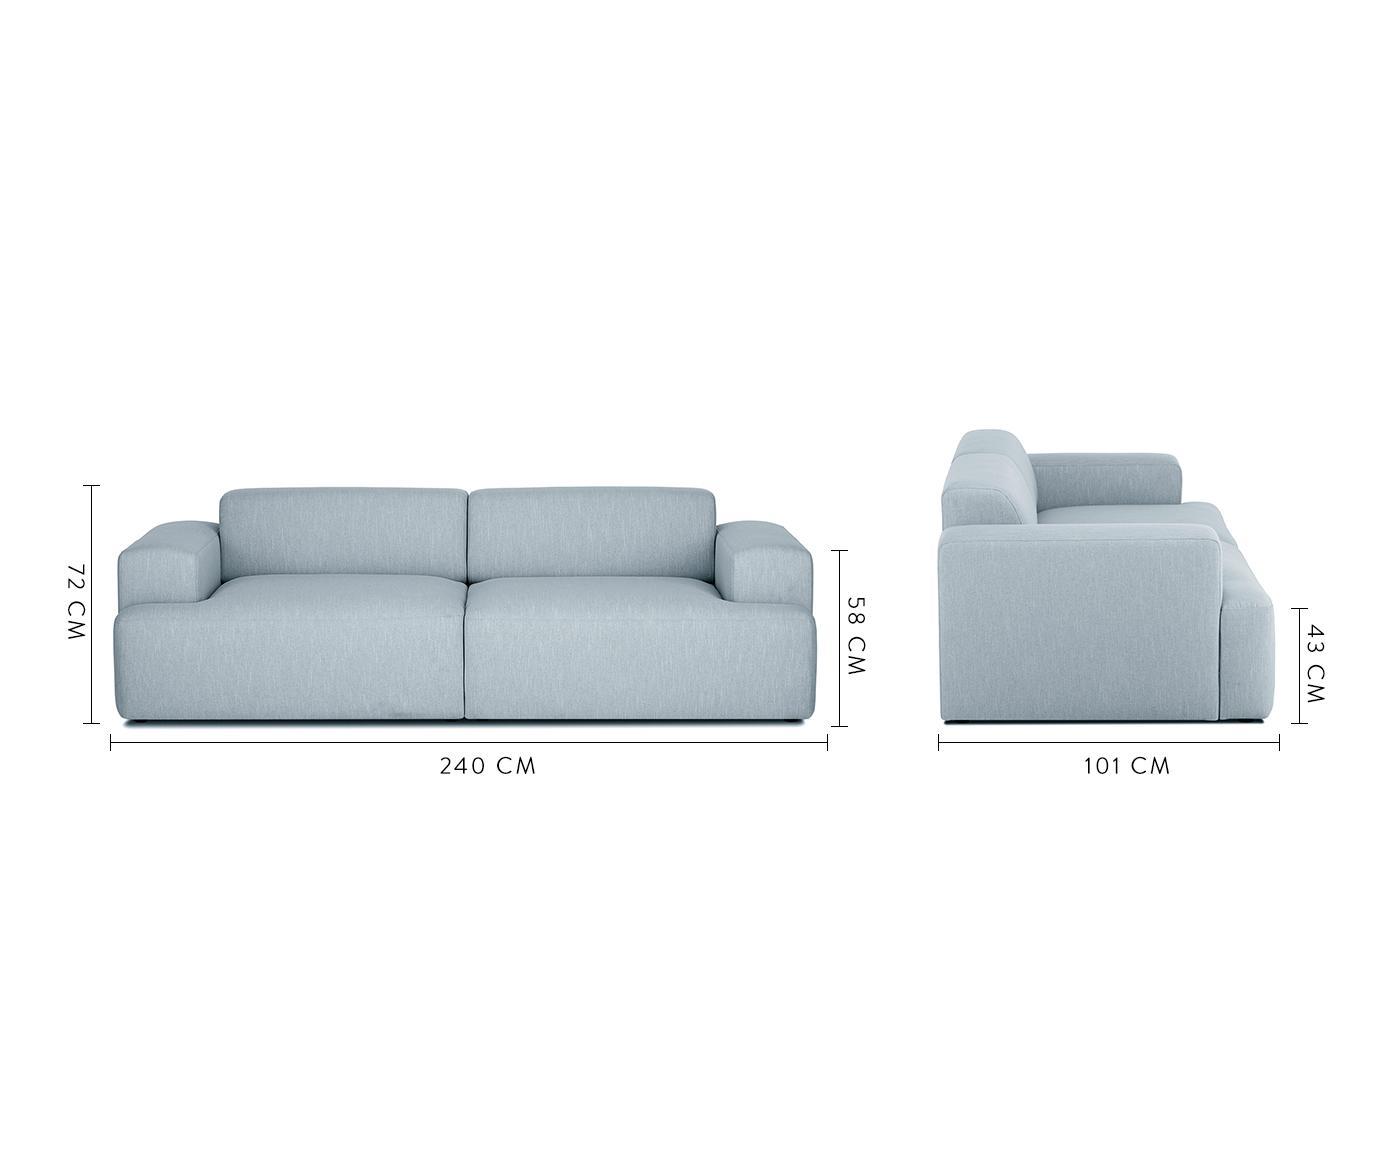 Sofa Melva (3-Sitzer), Bezug: Polyester 35.000 Scheuert, Gestell: Massives Kiefernholz, Spa, Füße: Kiefernholz, Webstoff Blaugrau, B 240 x T 101 cm